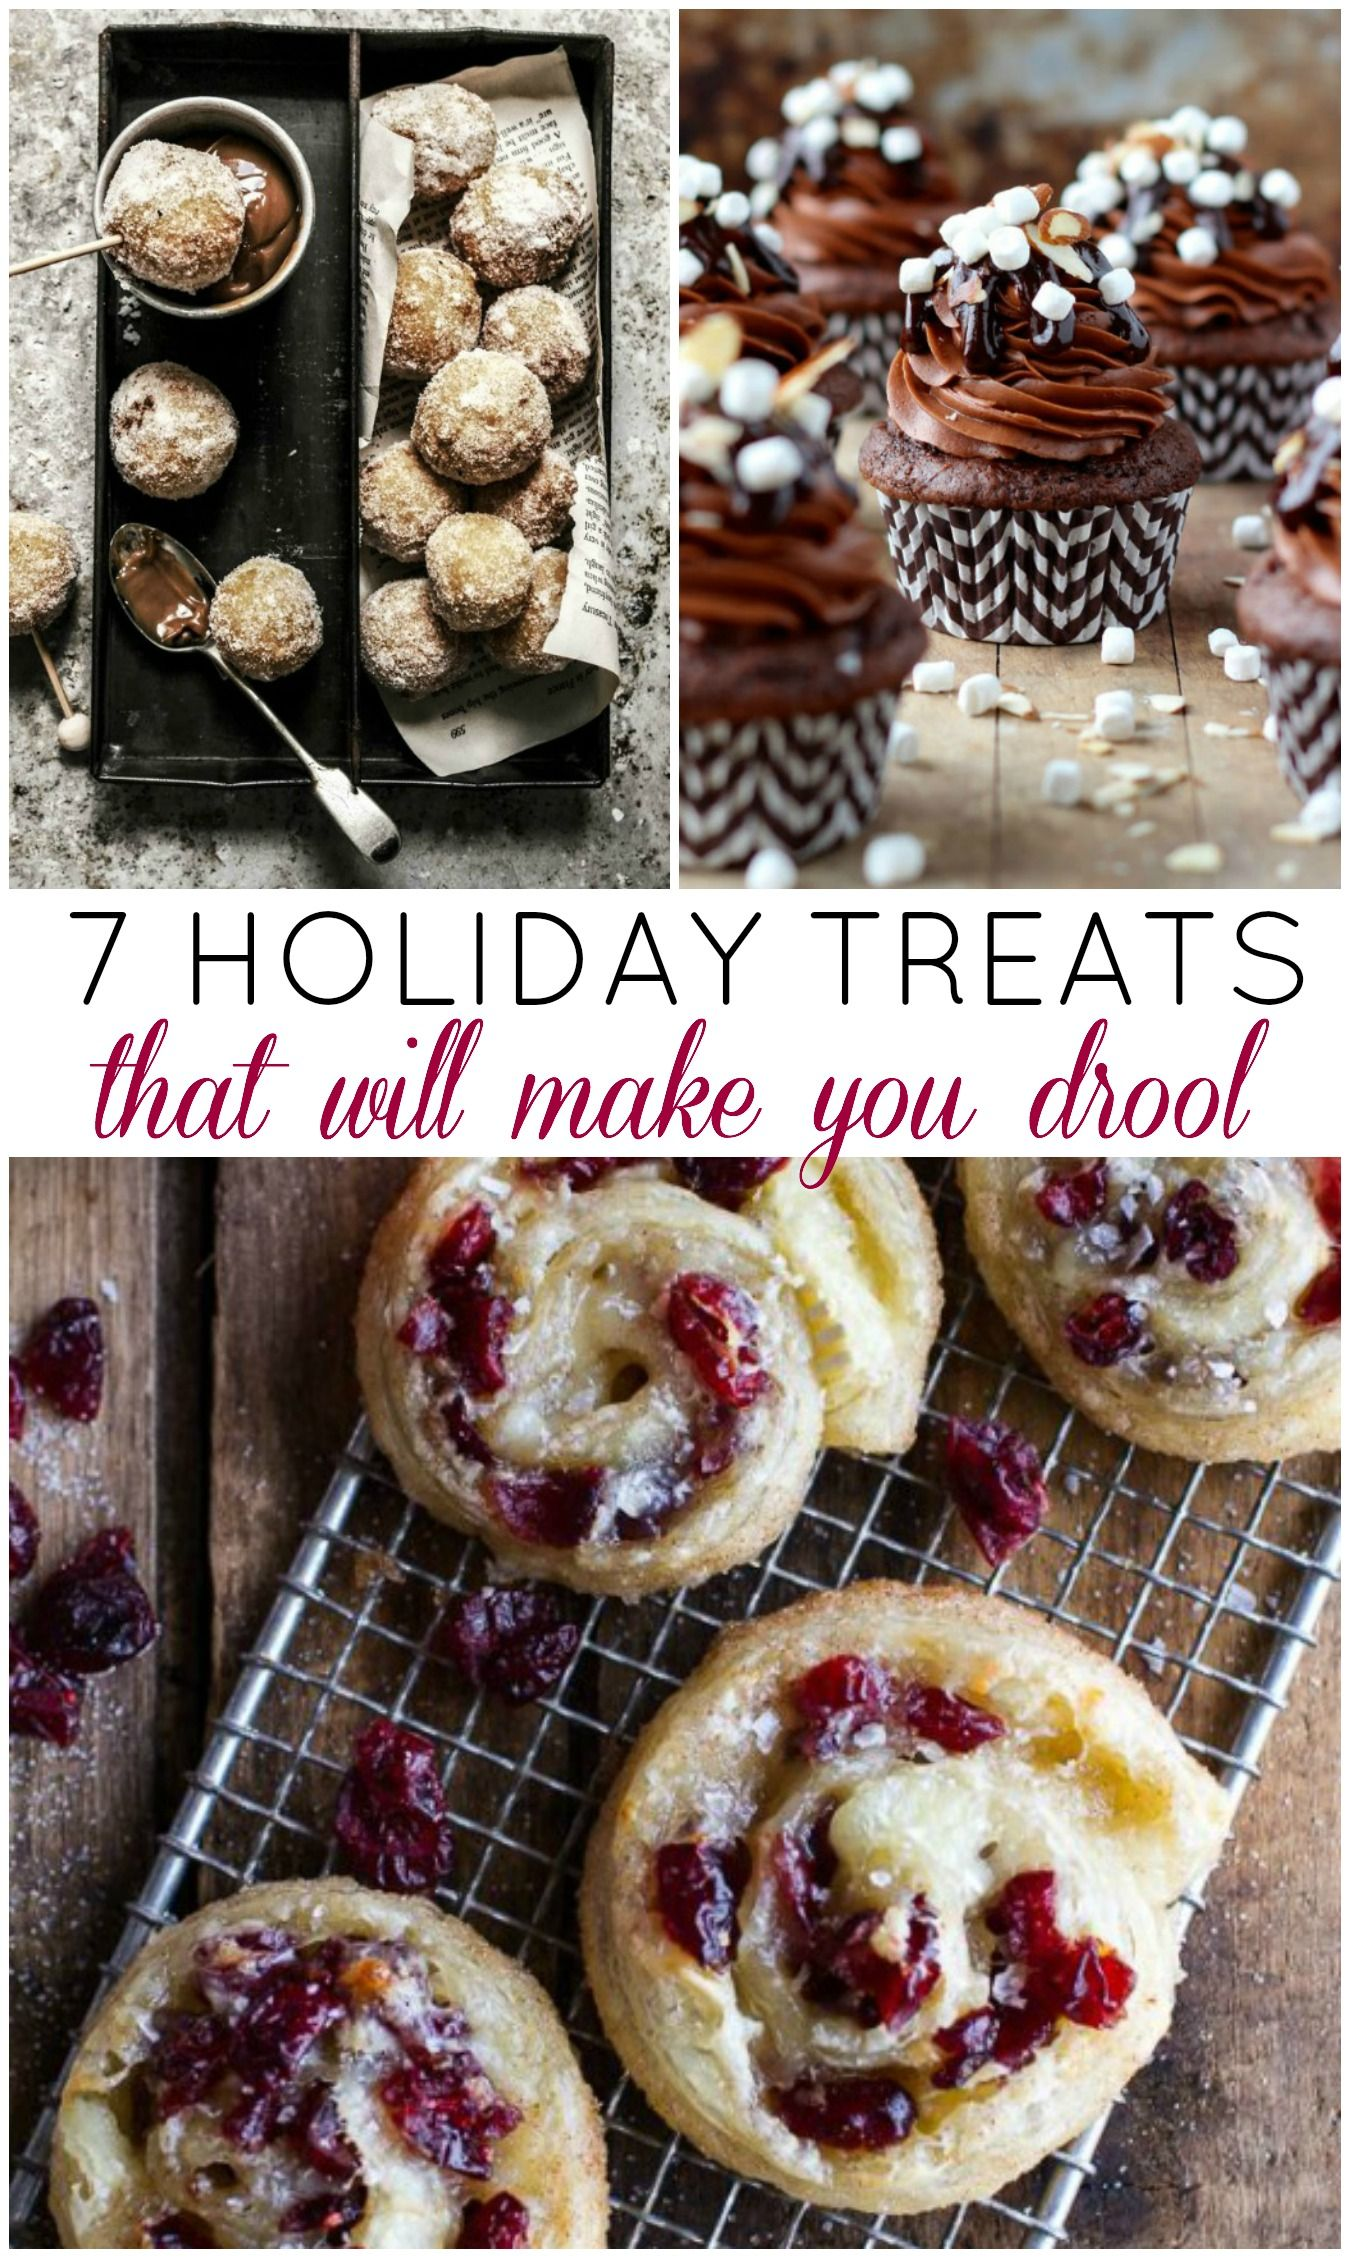 7 Yummy Holiday Treats to Make This Year - Recipes